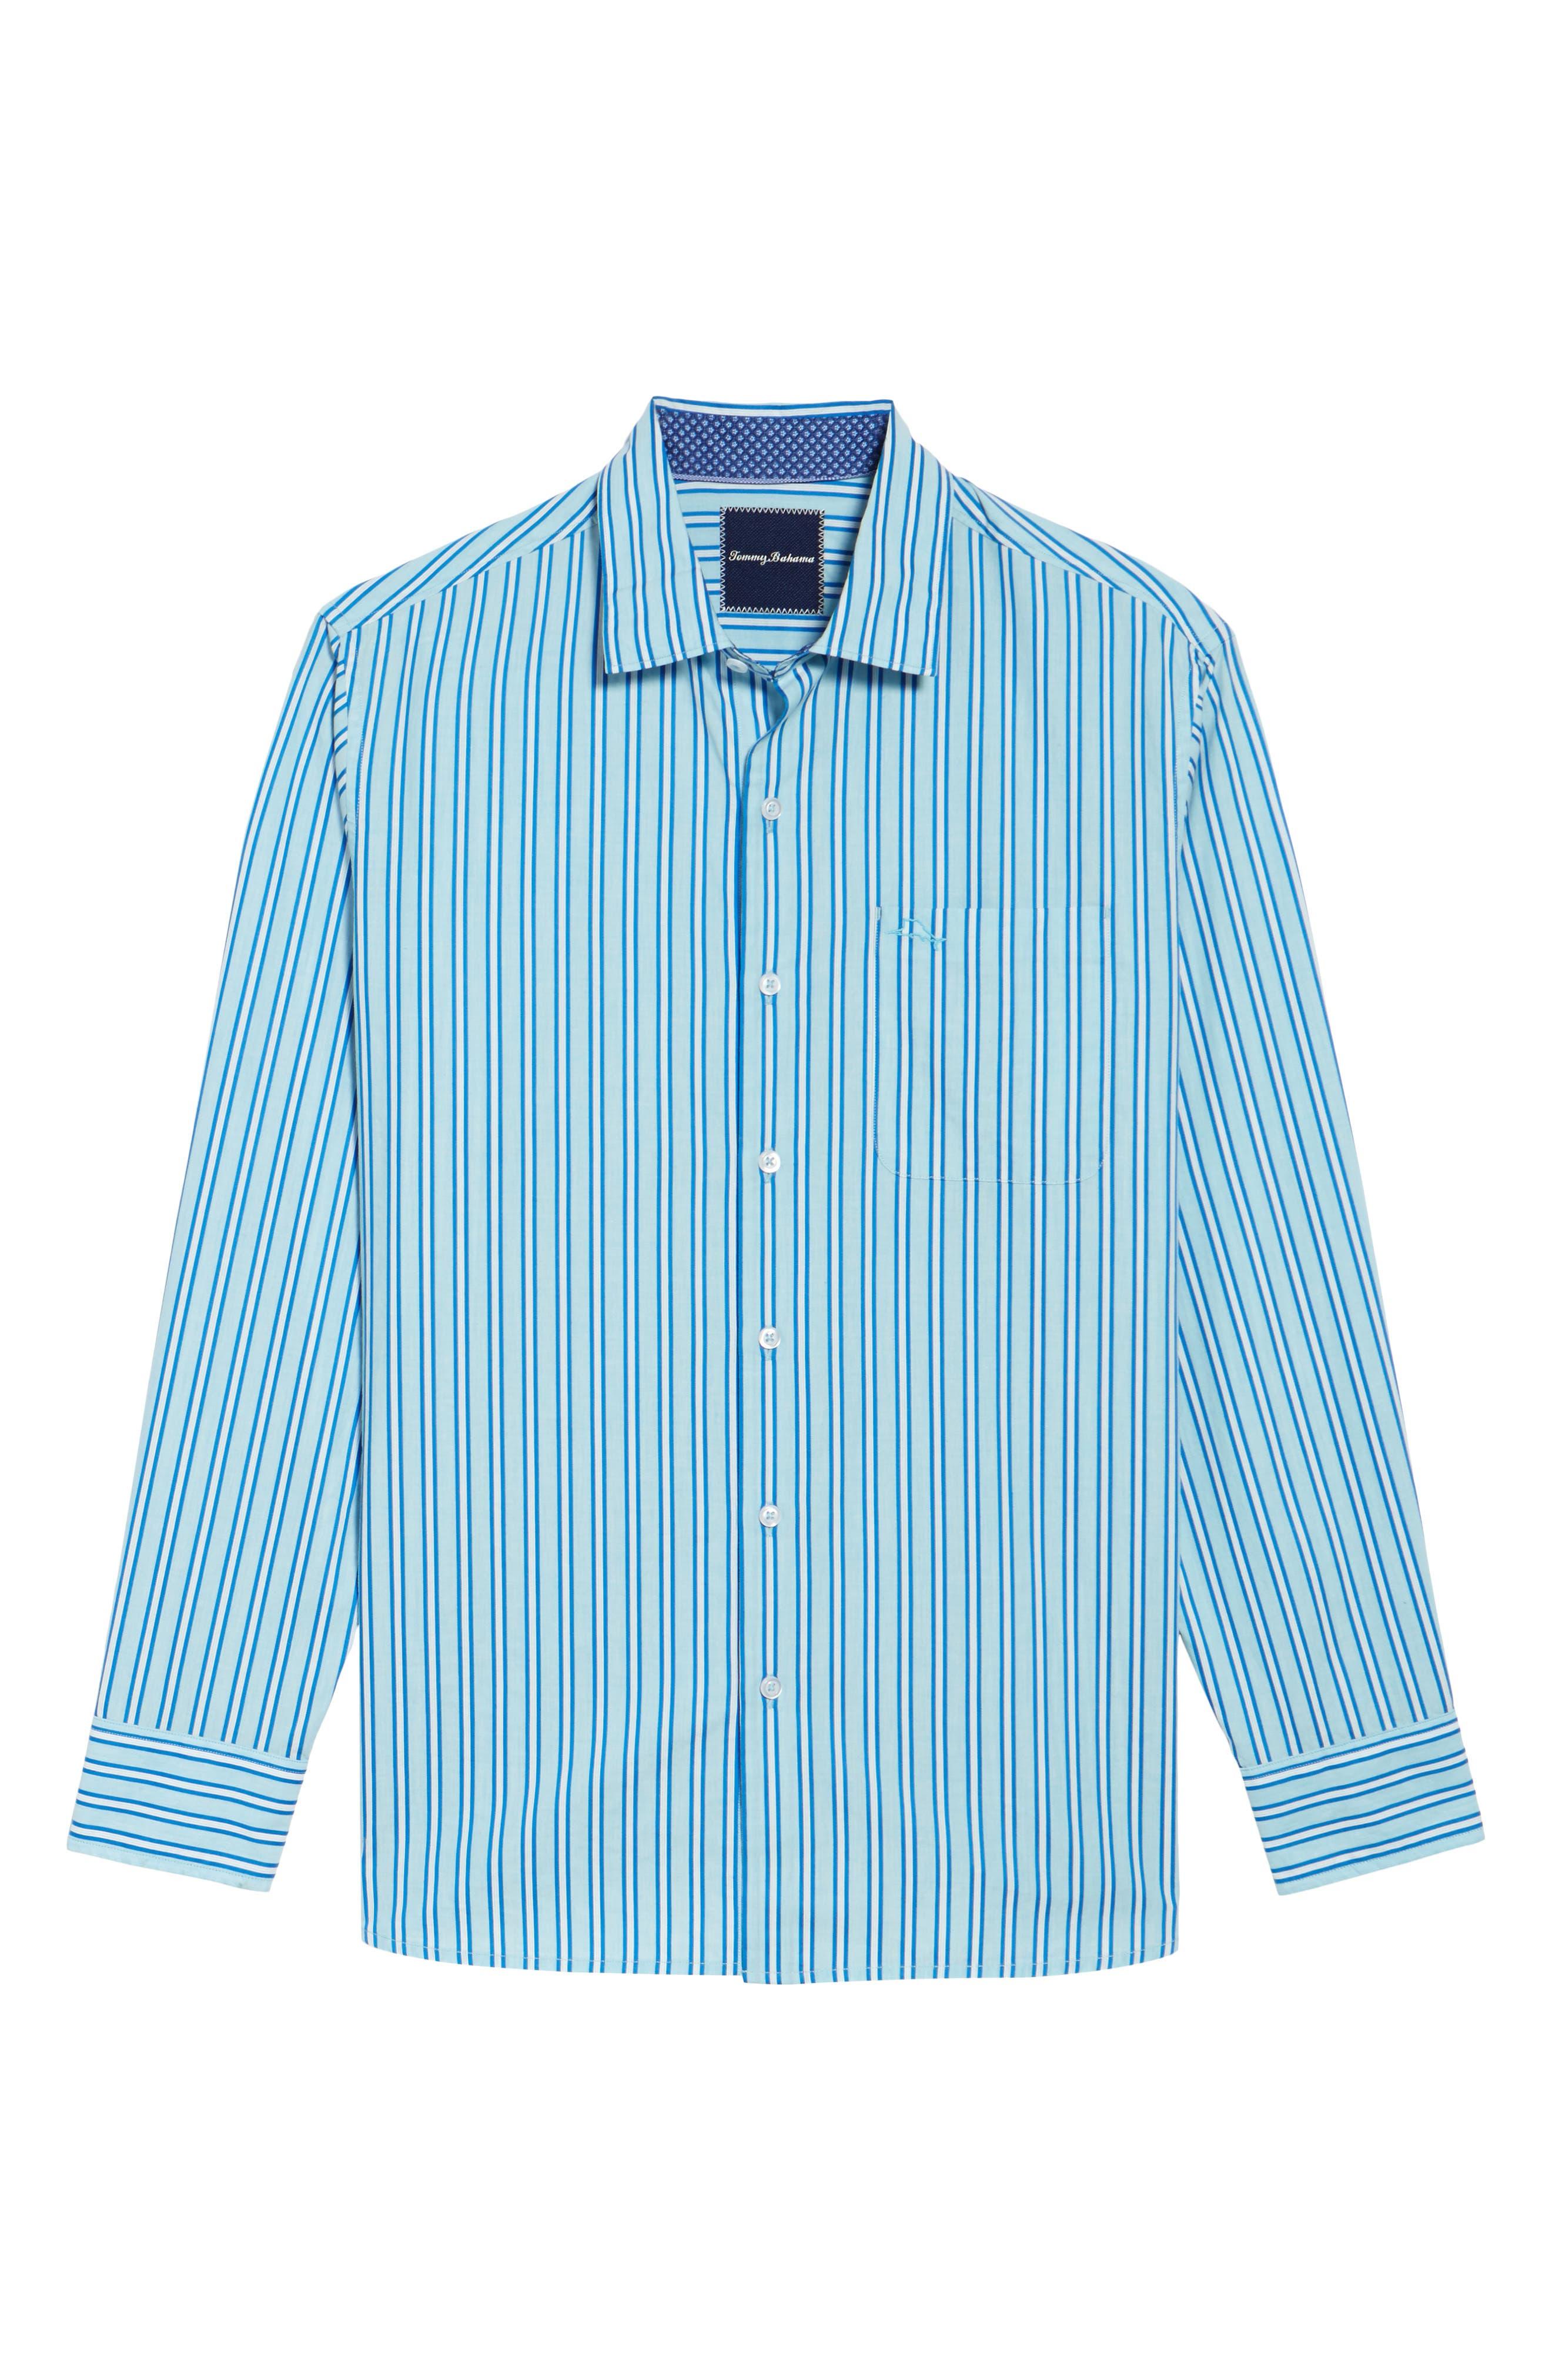 Surf the Line Stripe Sport Shirt,                             Alternate thumbnail 6, color,                             400